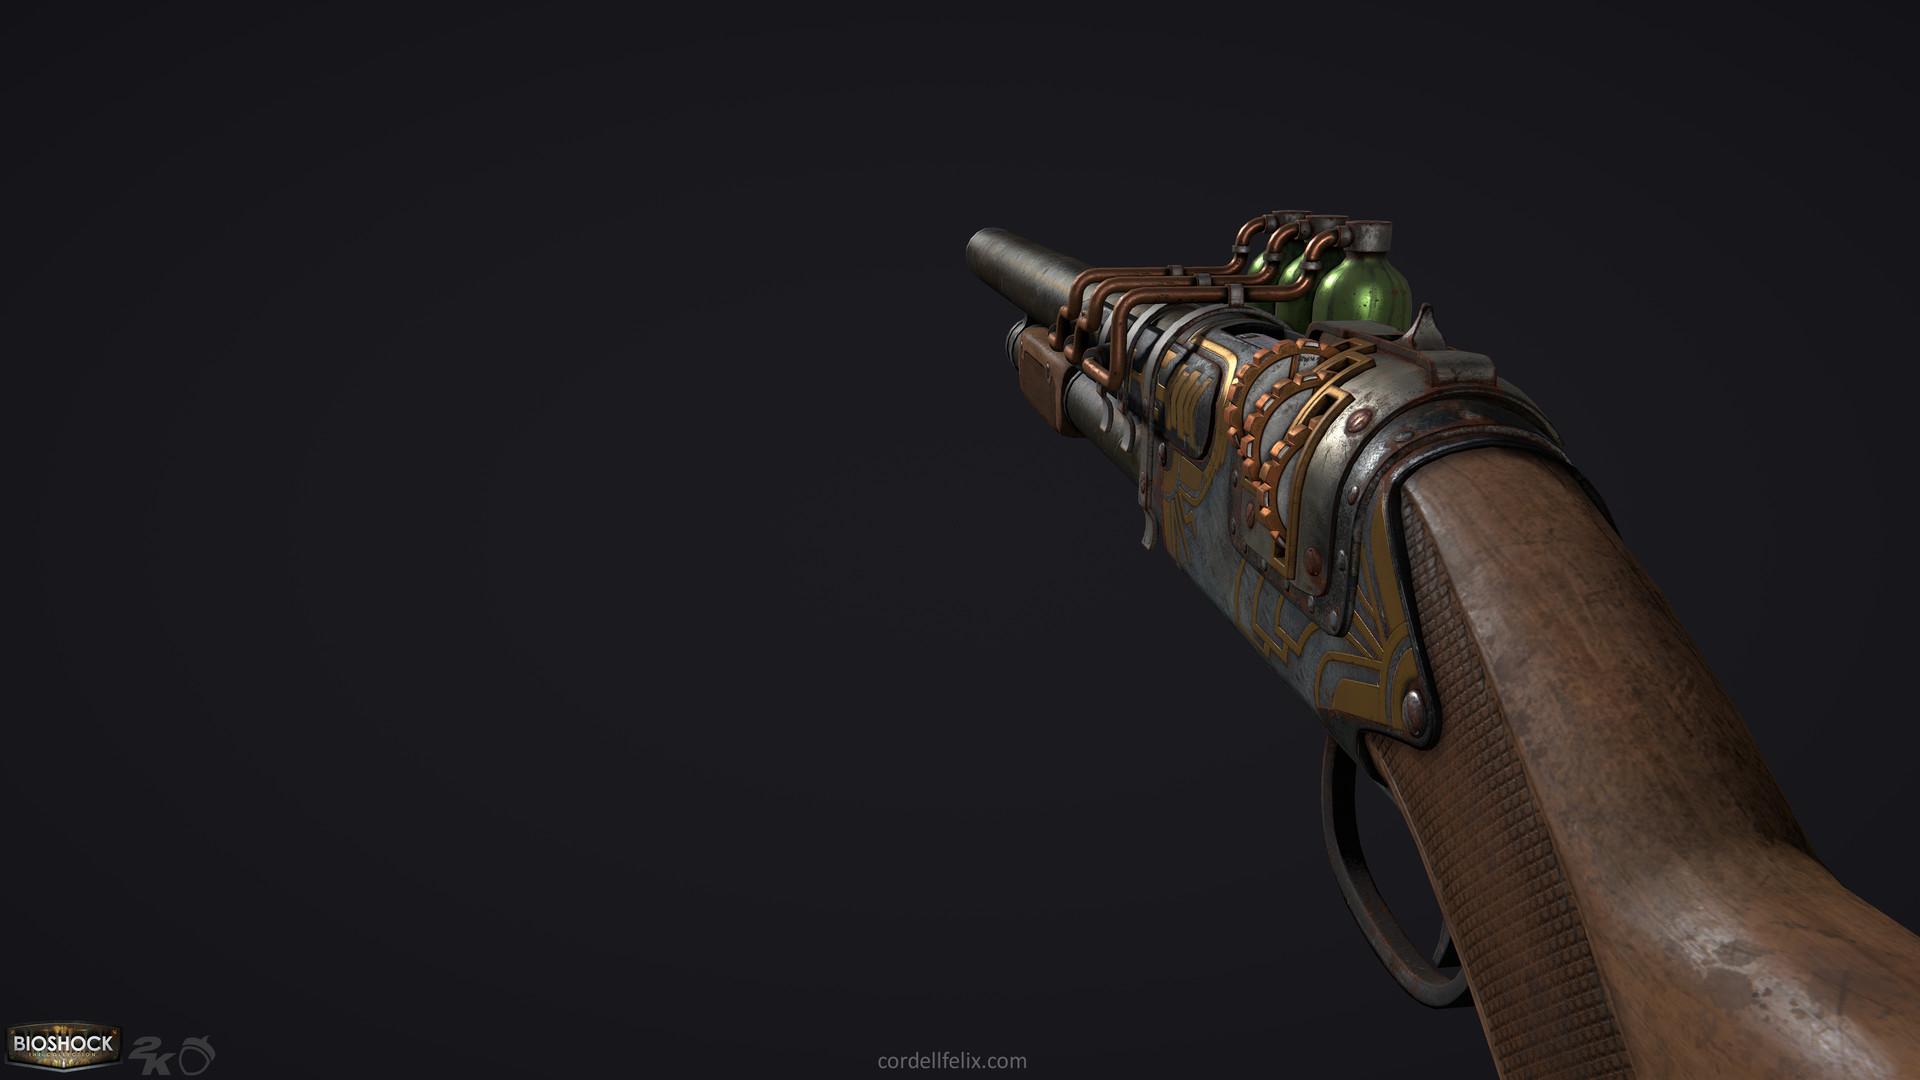 Cordell felix cordellfelix shotgun 01